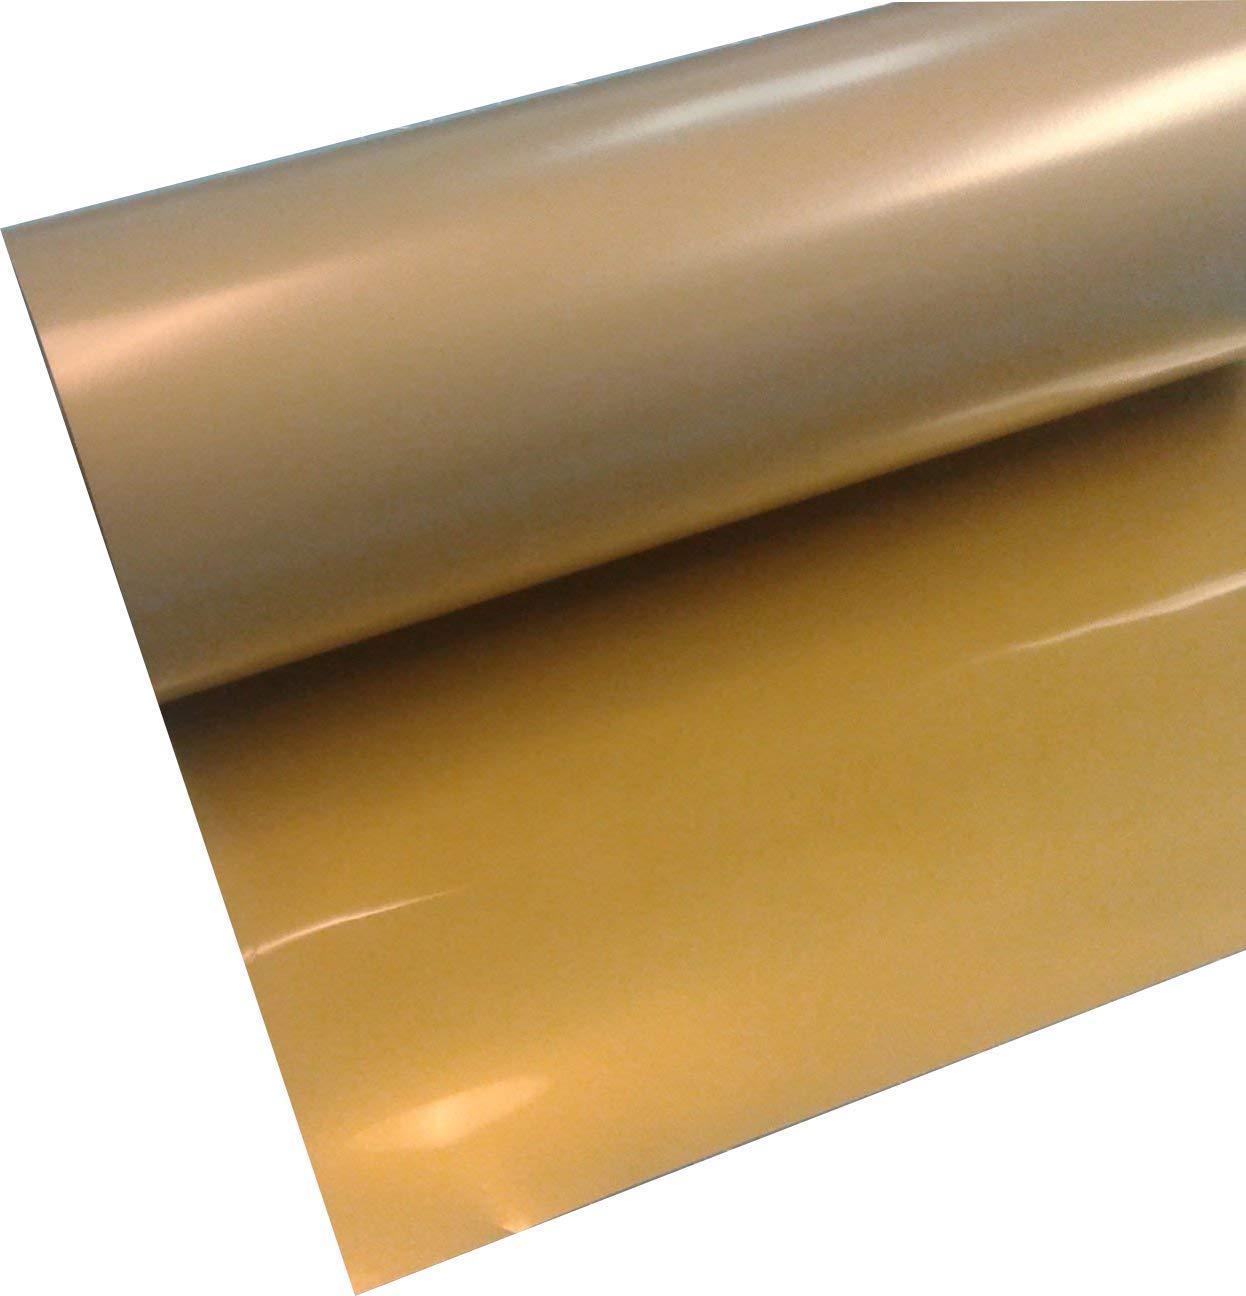 Siser Easyweed Gold 15' x 3' Iron on Heat Transfer Vinyl Roll